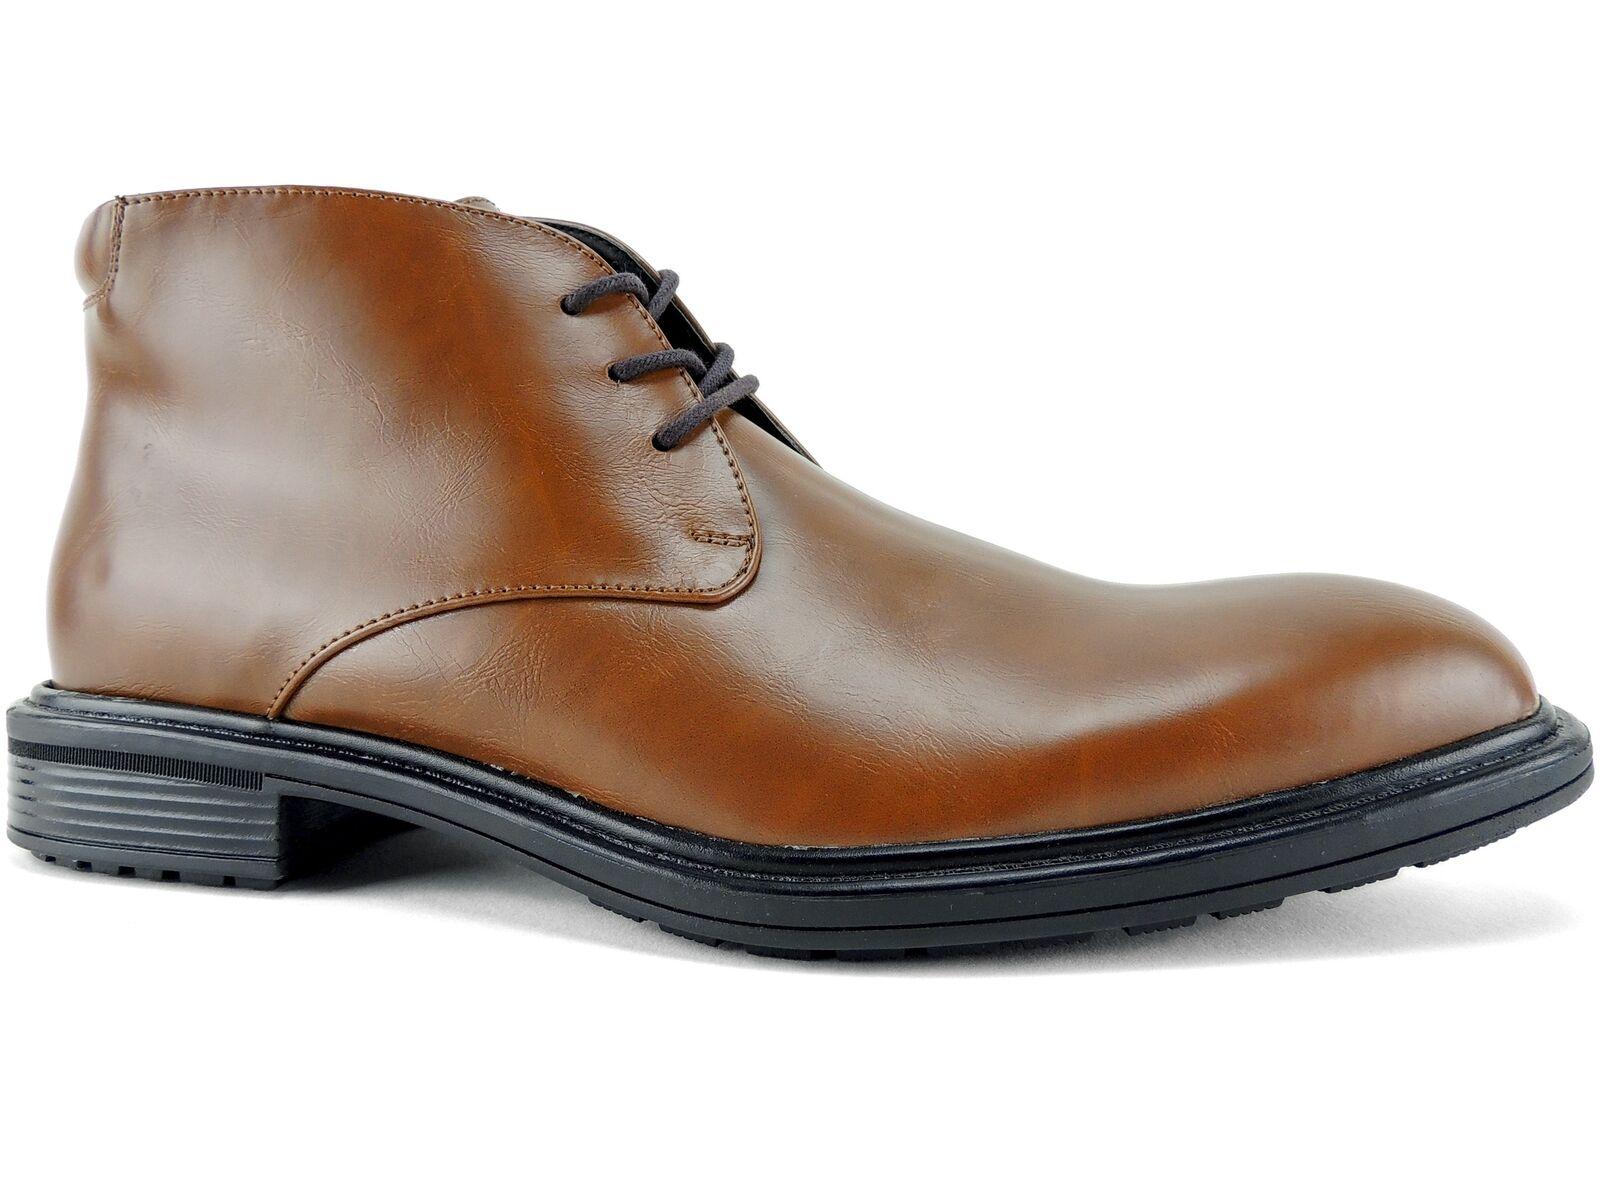 Alfani Men's Turner Chukka Boots Tan Size 12 M